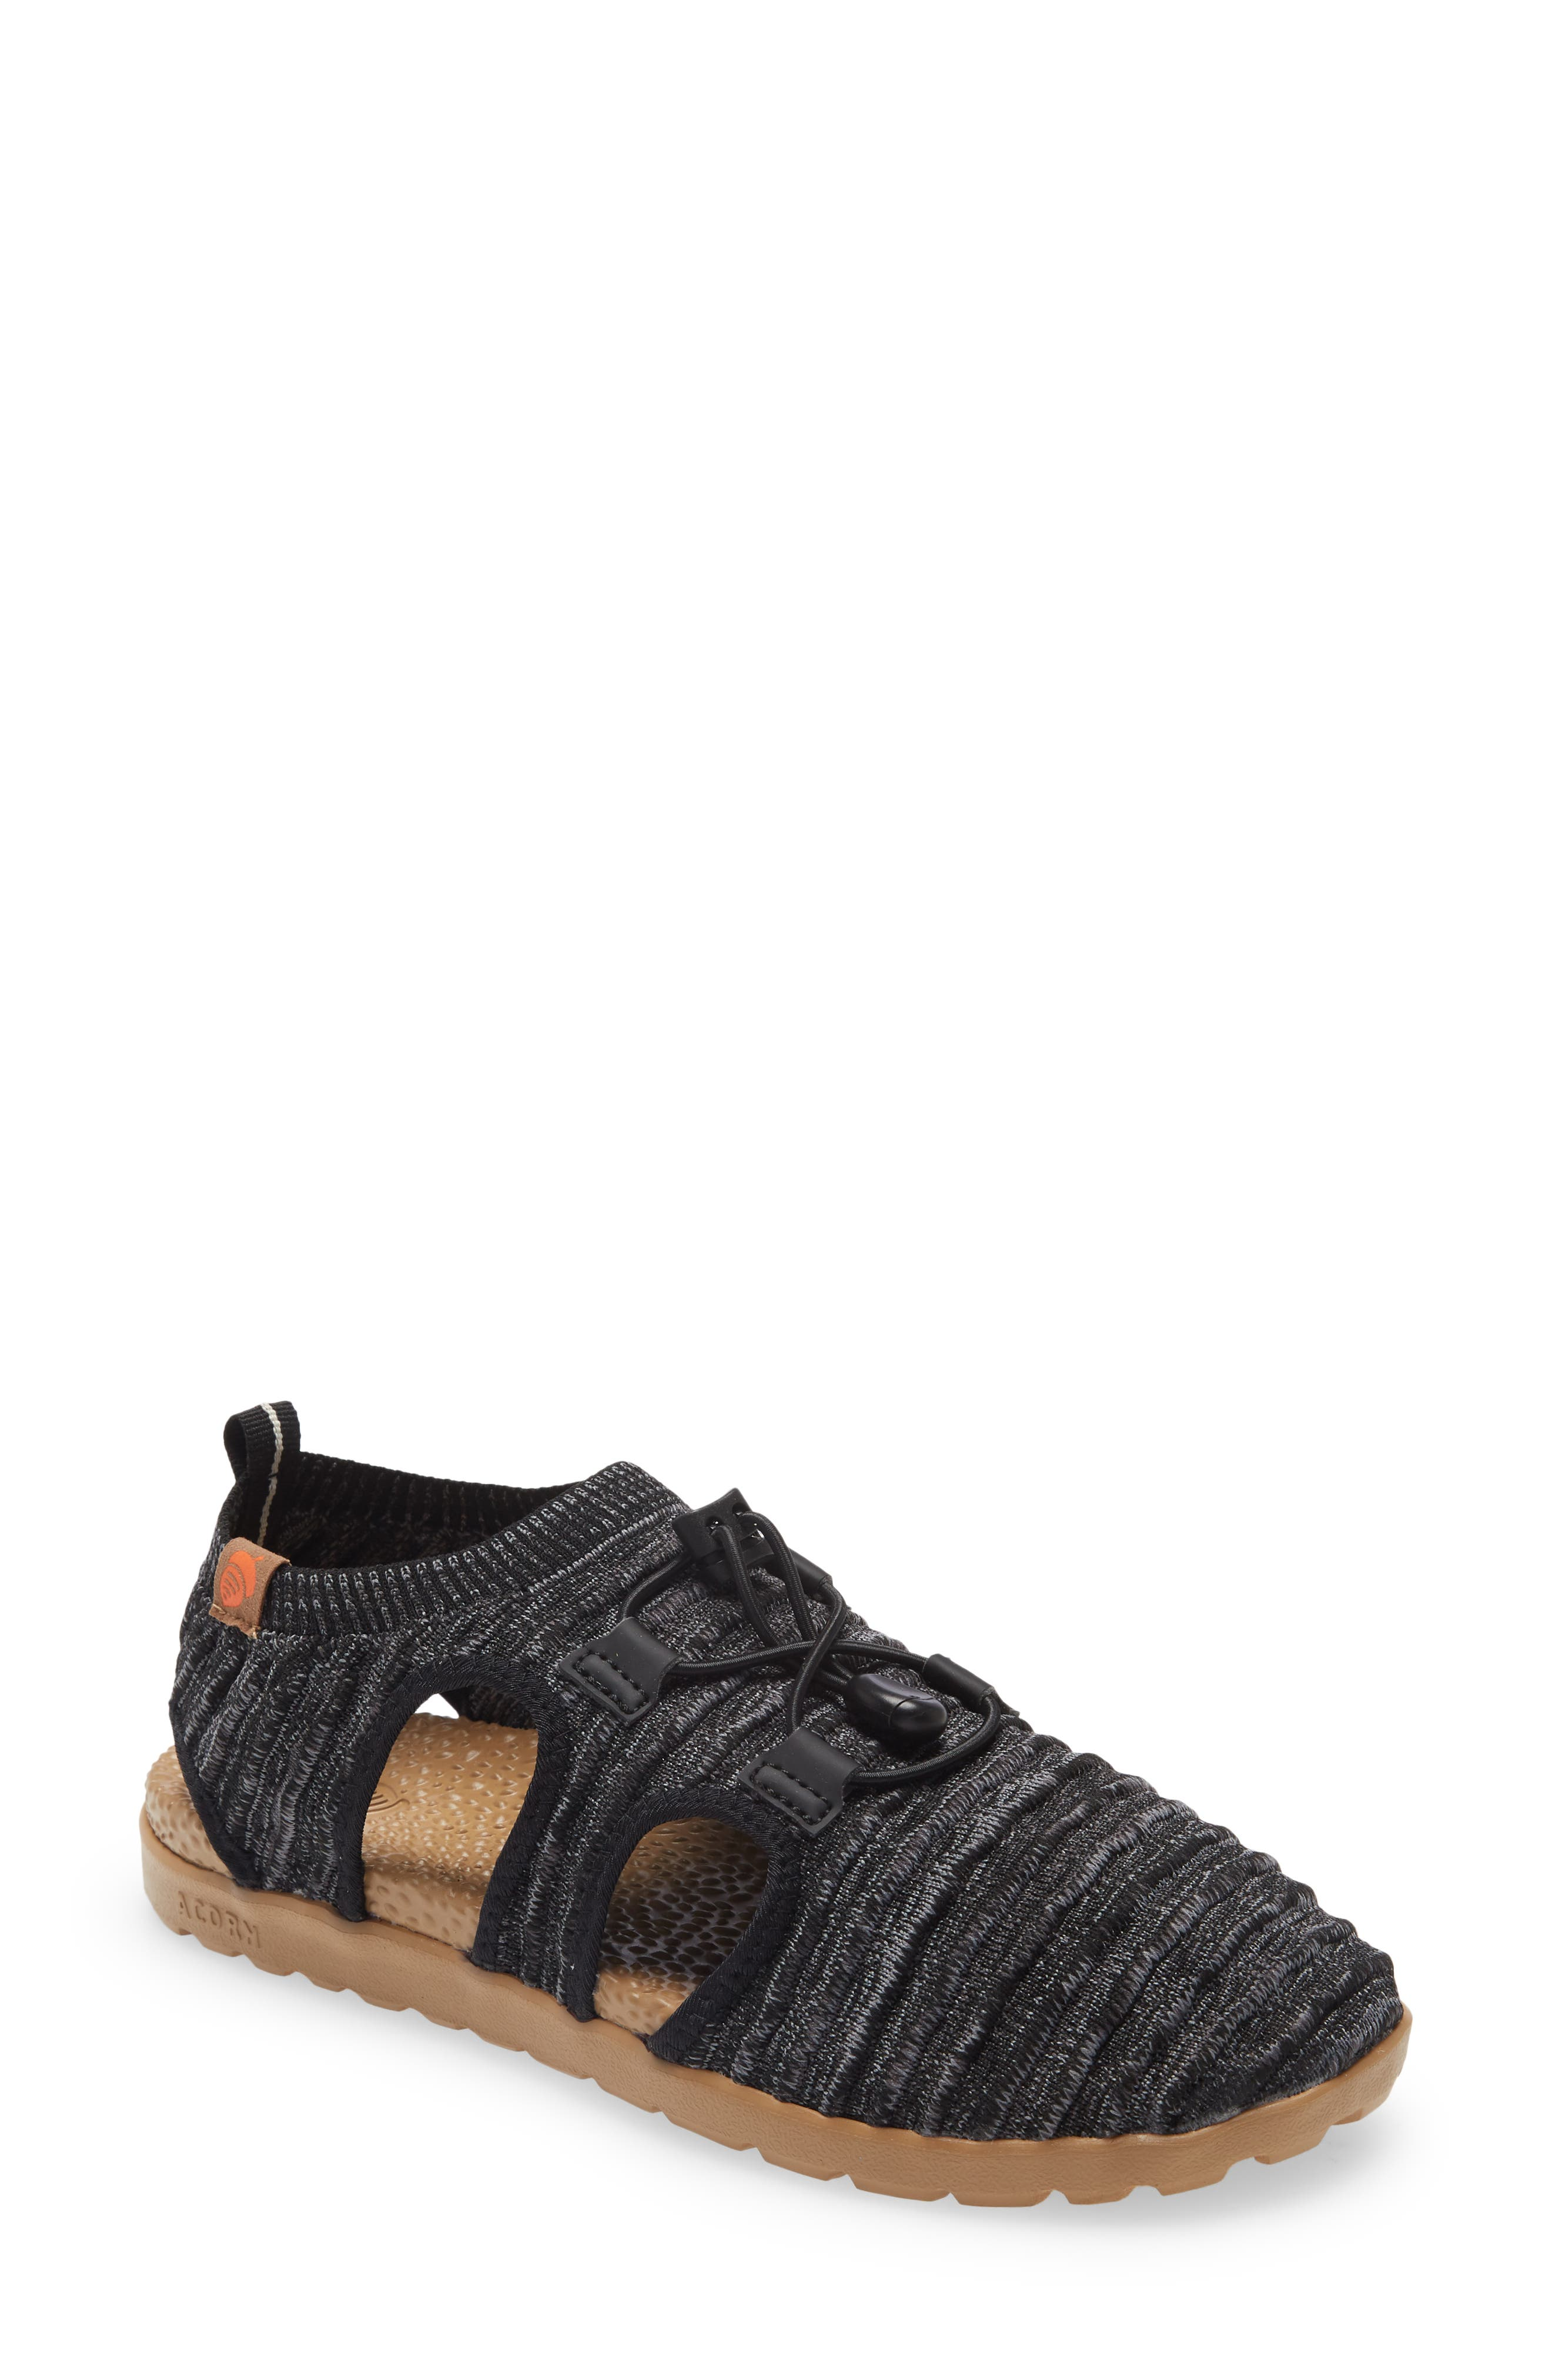 Casco Toggle Sport Sandal